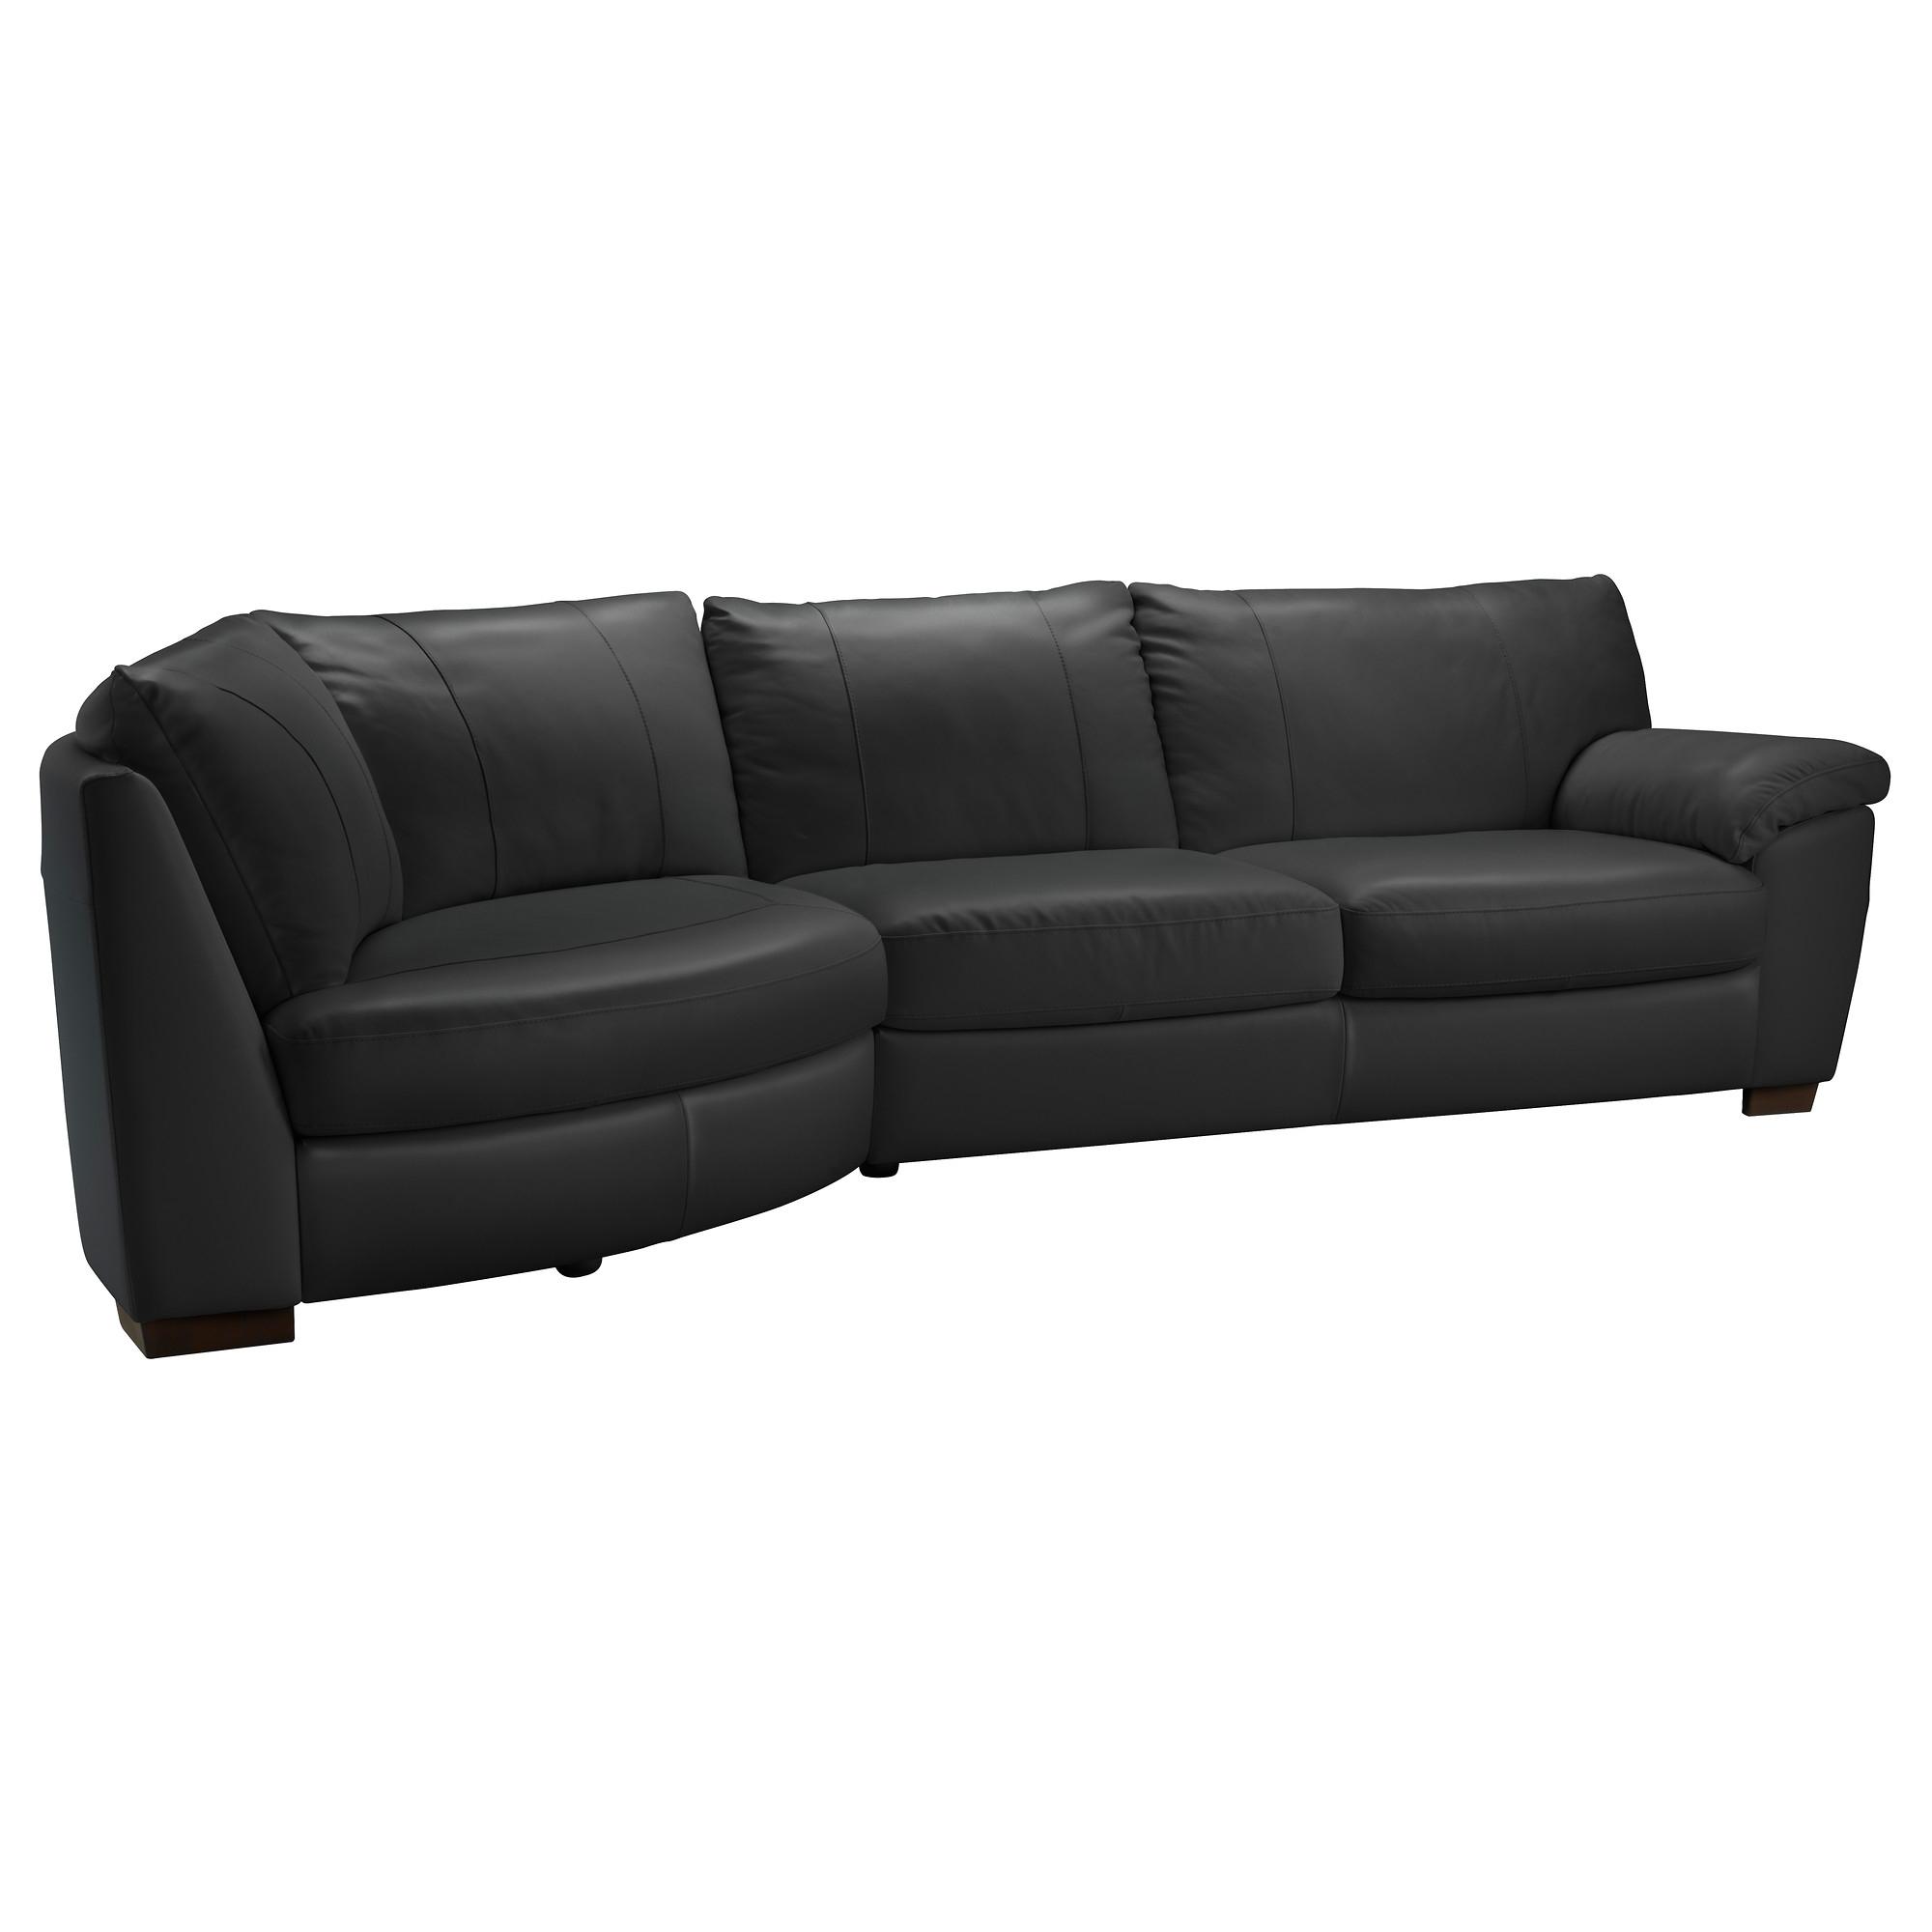 Vreta Corner Sofa With End Unit Right – Mjuk Ivory – Ikea $1749 Regarding Well Liked Kijiji London Sectional Sofas (Gallery 16 of 20)